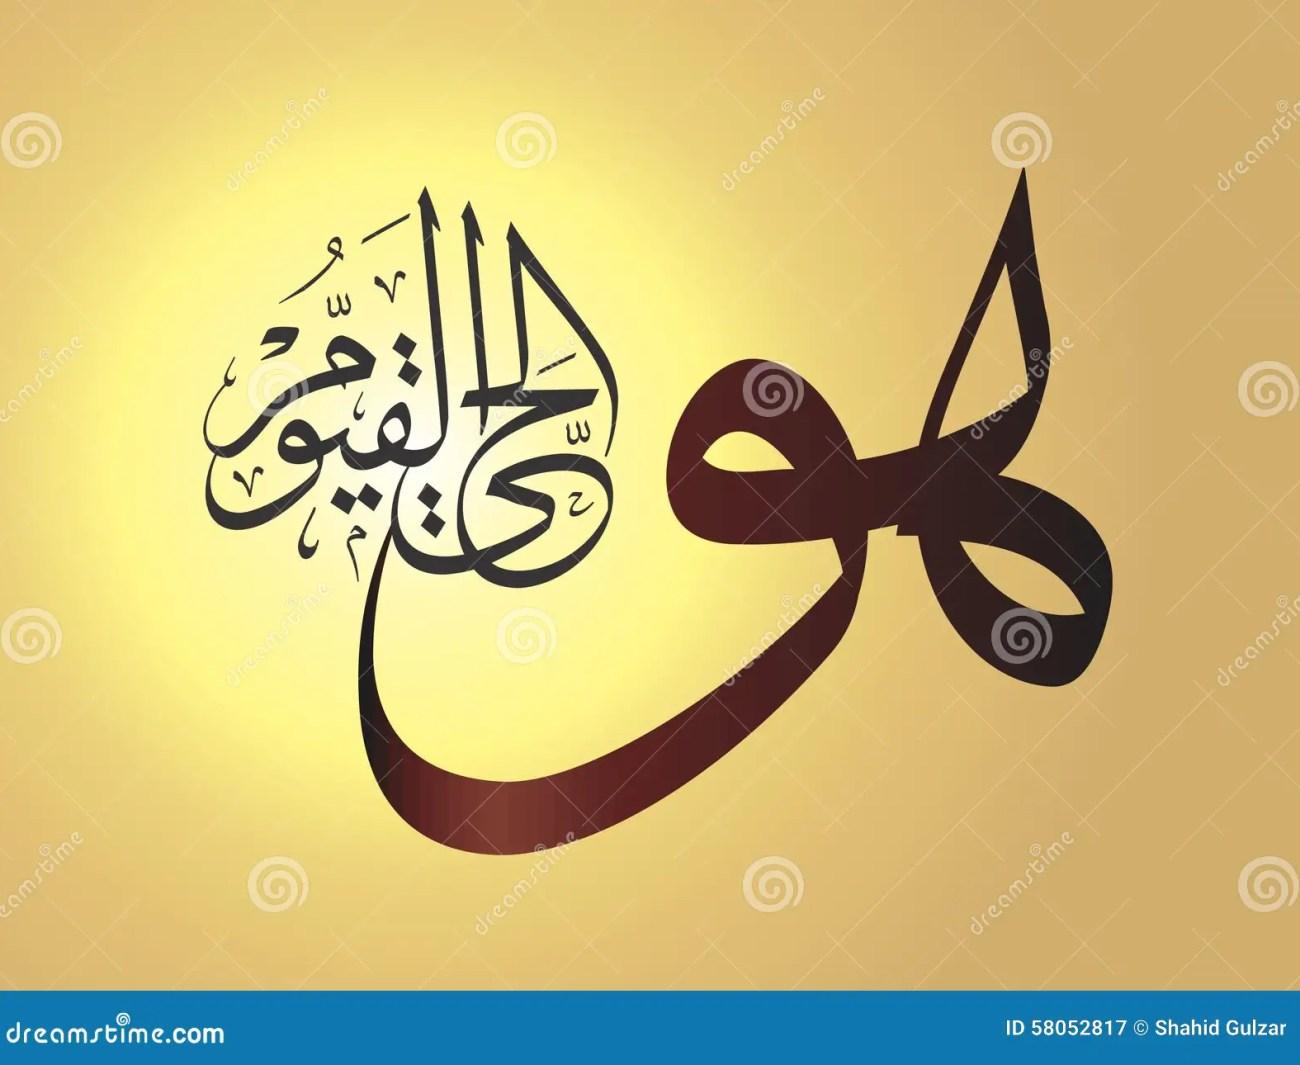 islamic calligraphy wallpaper poster howal hayul qayum stock photo